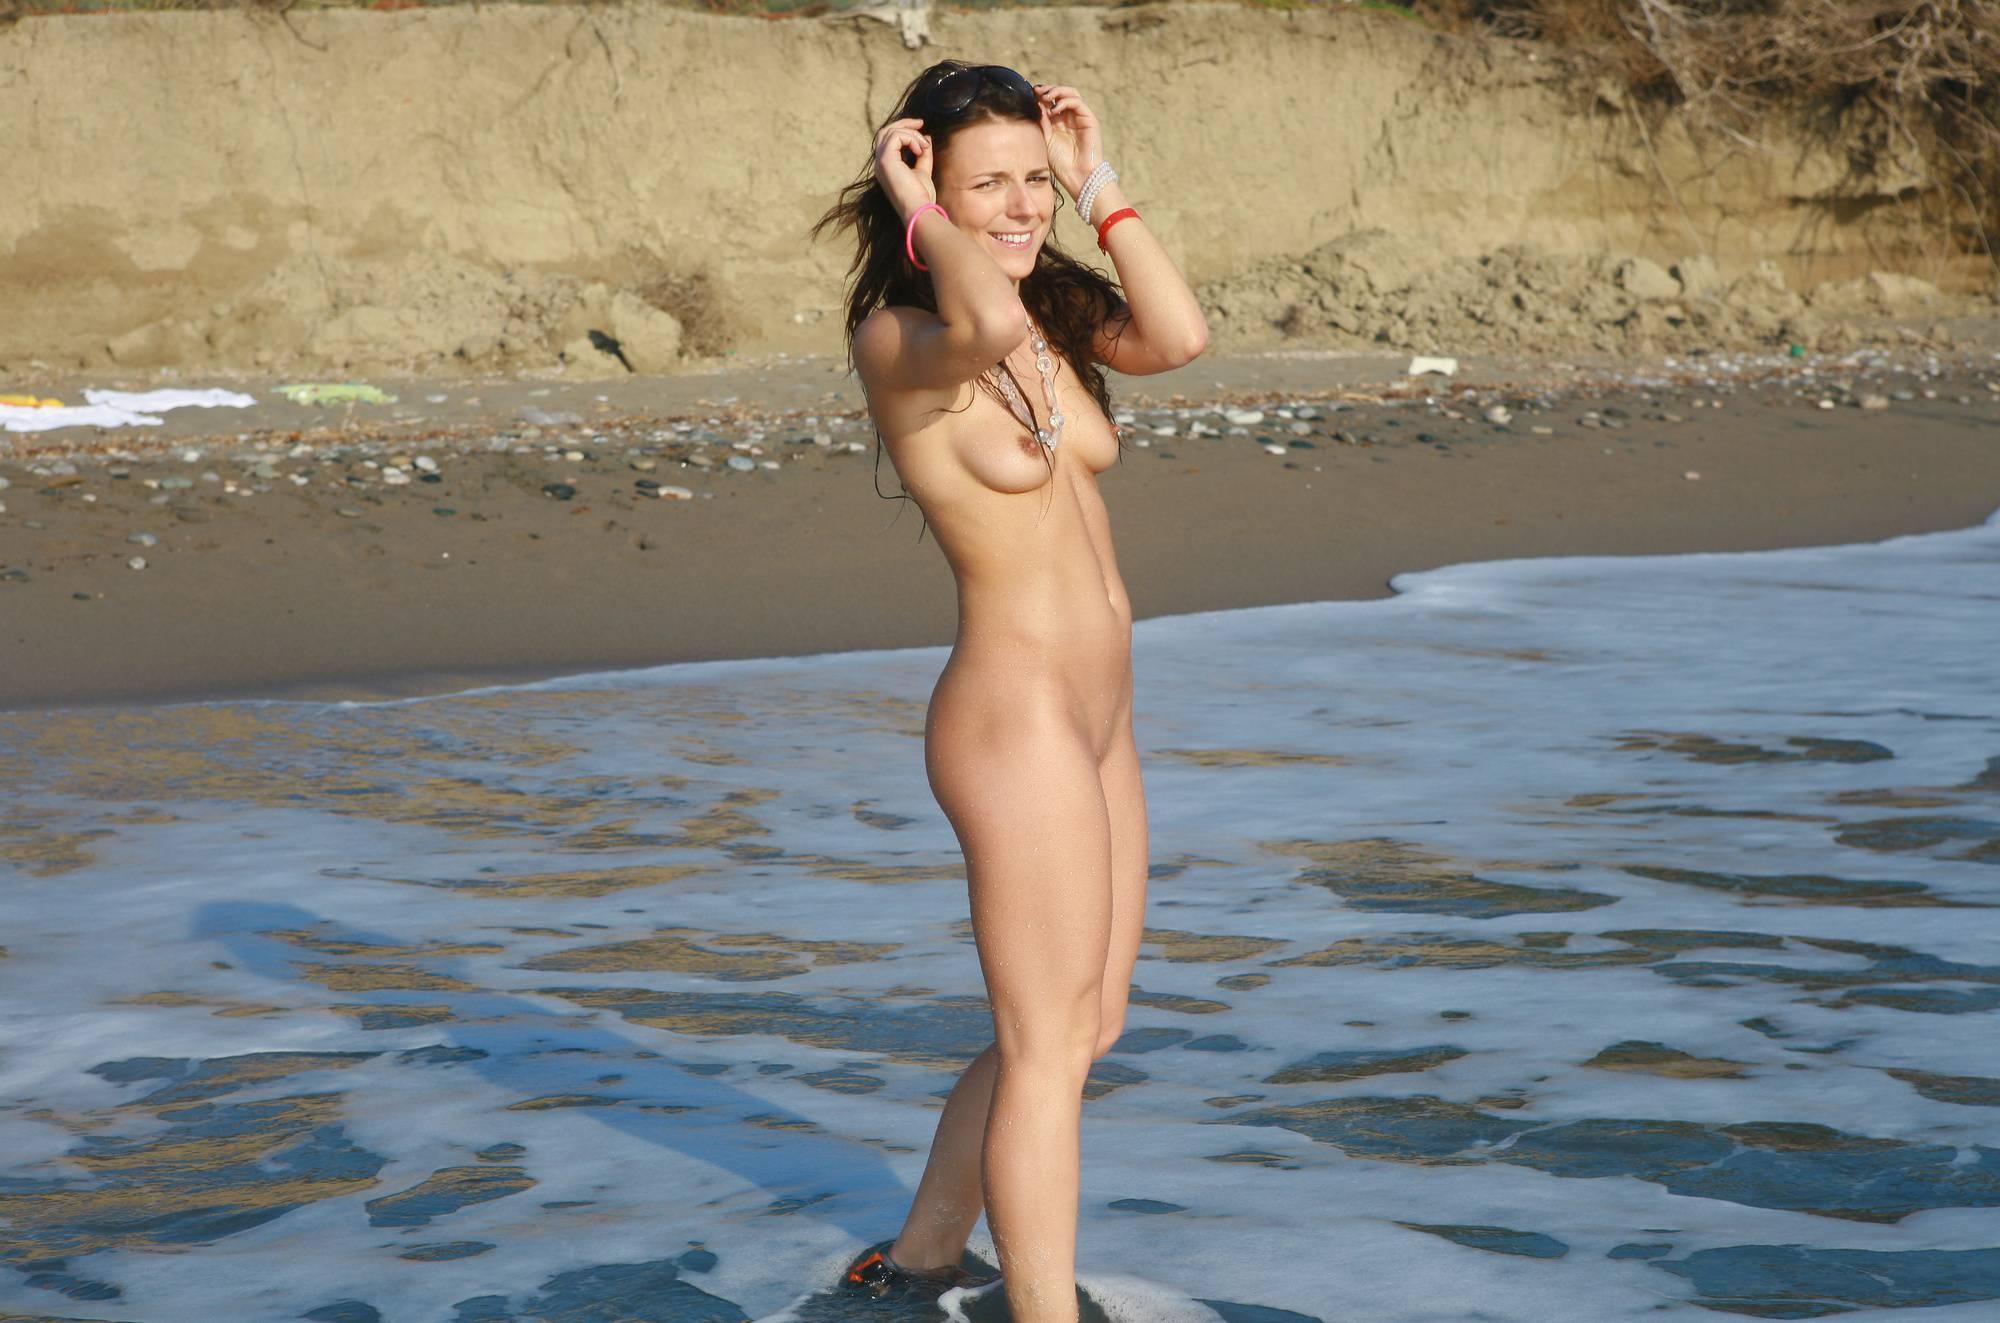 Pure Nudism Greek Splish Splash Fun - 3